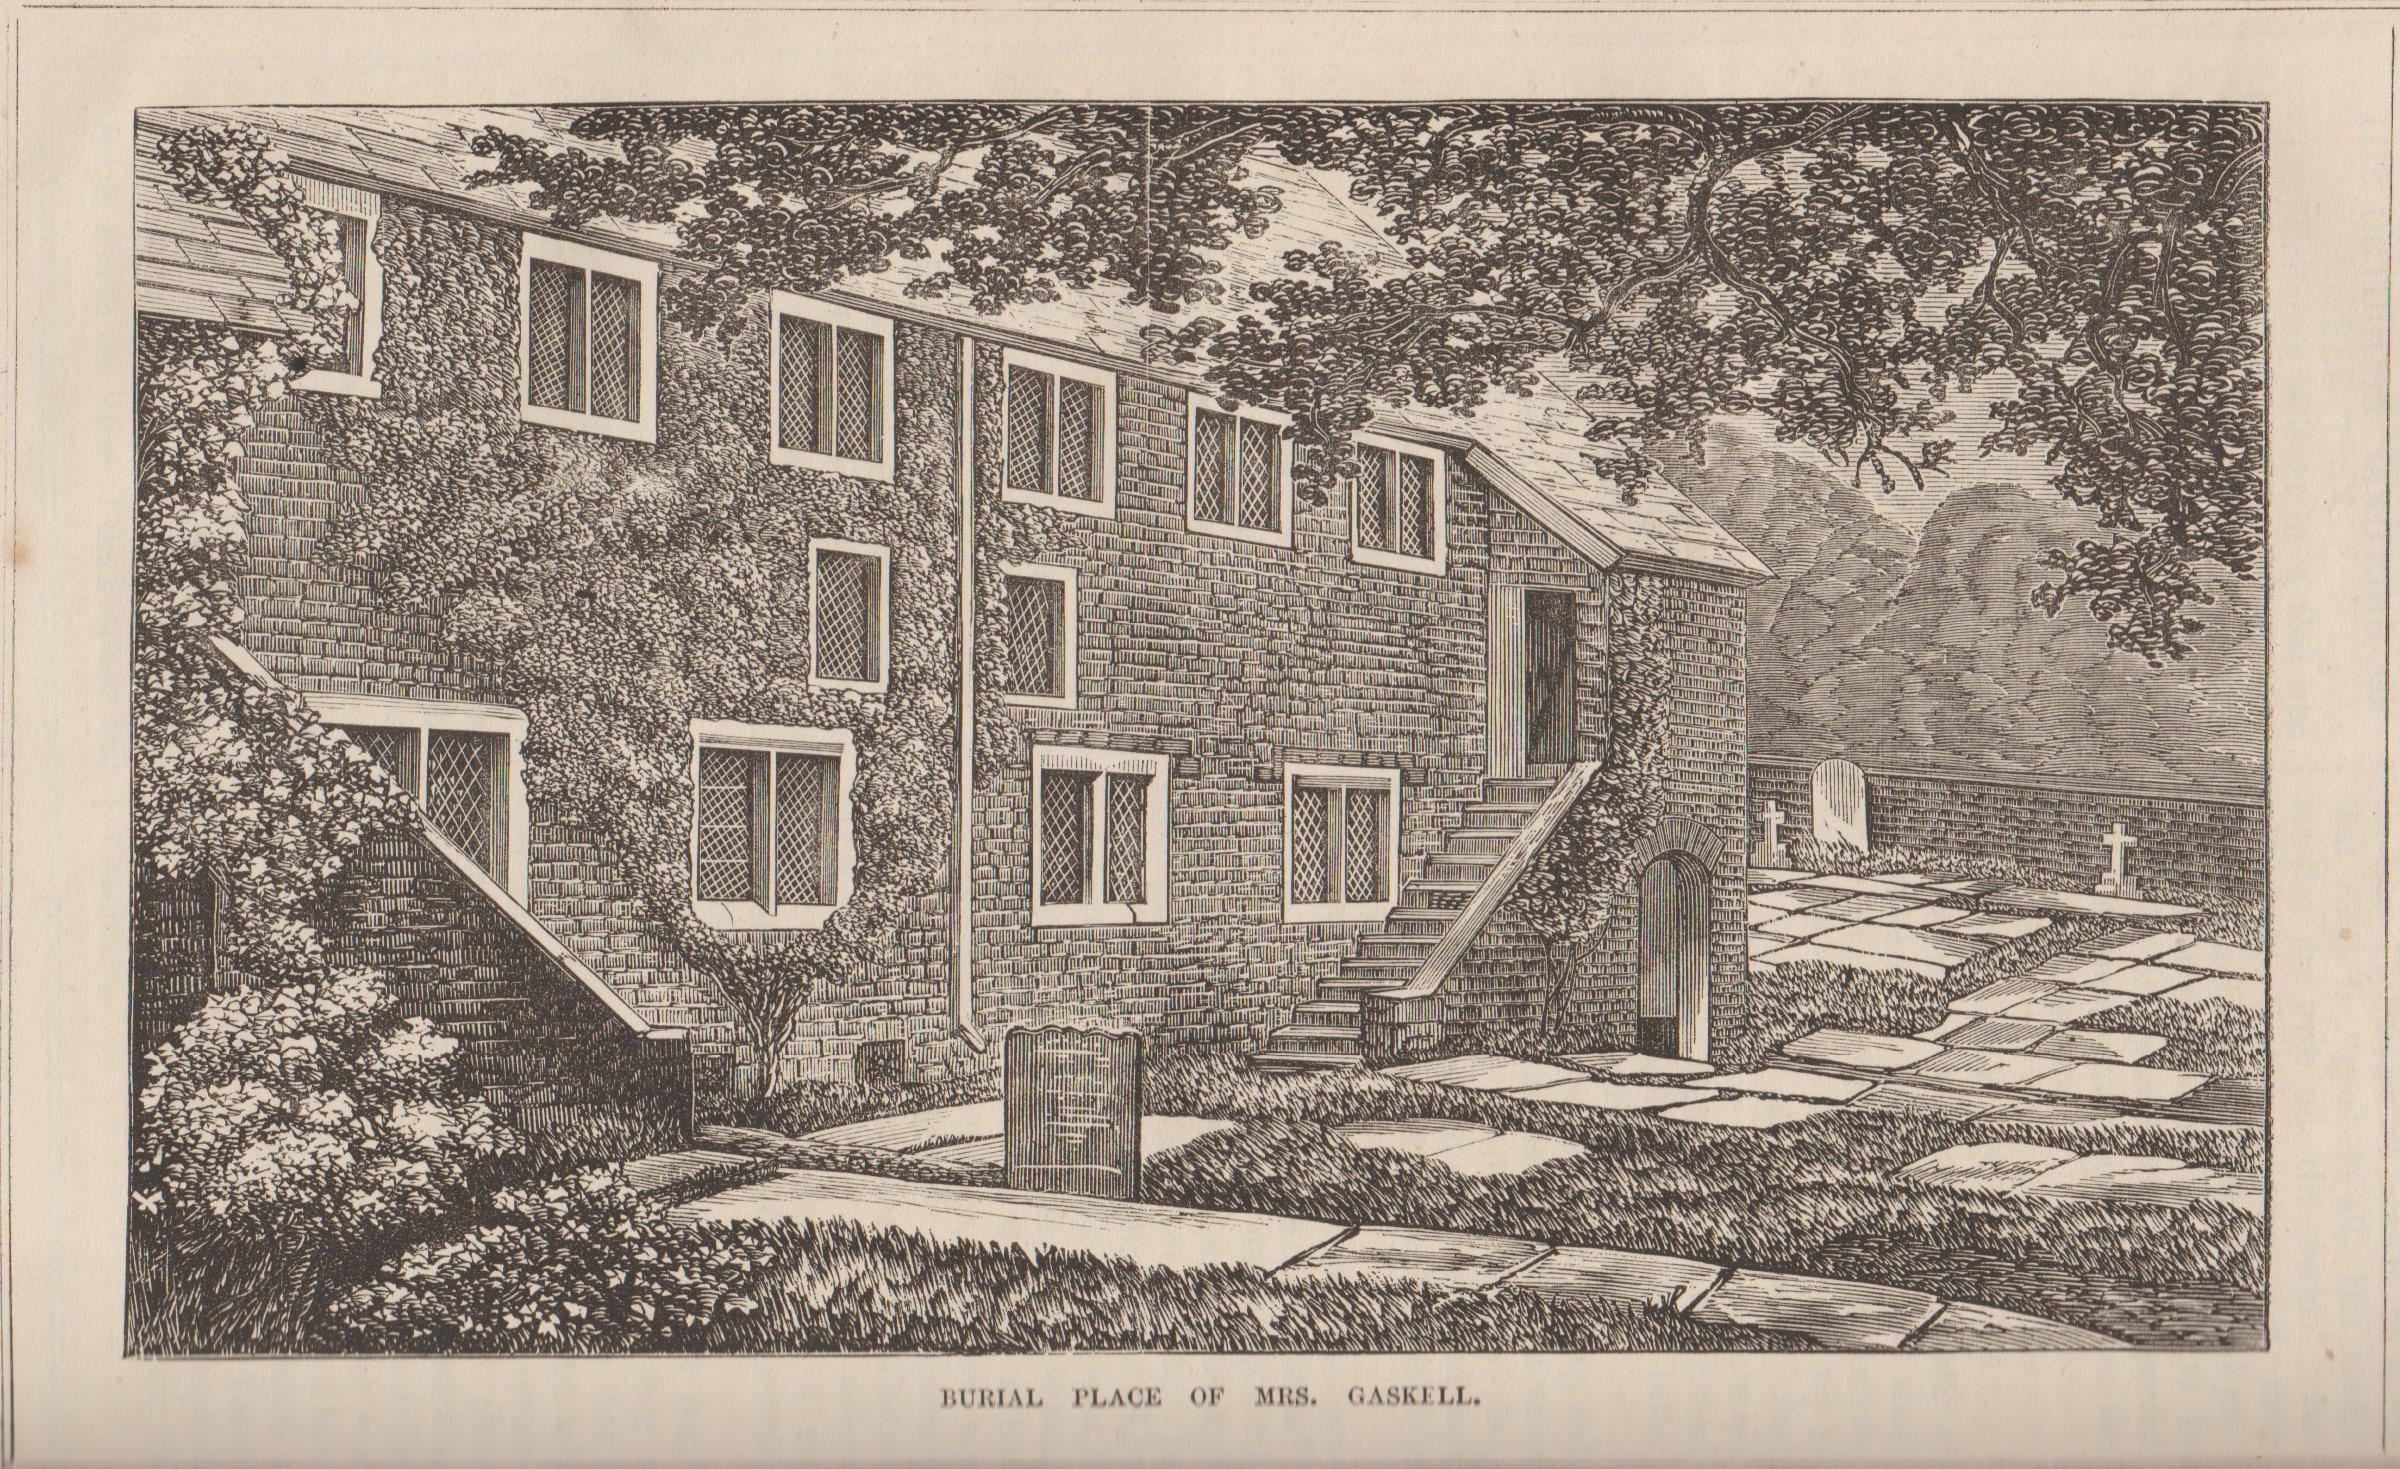 Knutsford Christian Freeman 1866